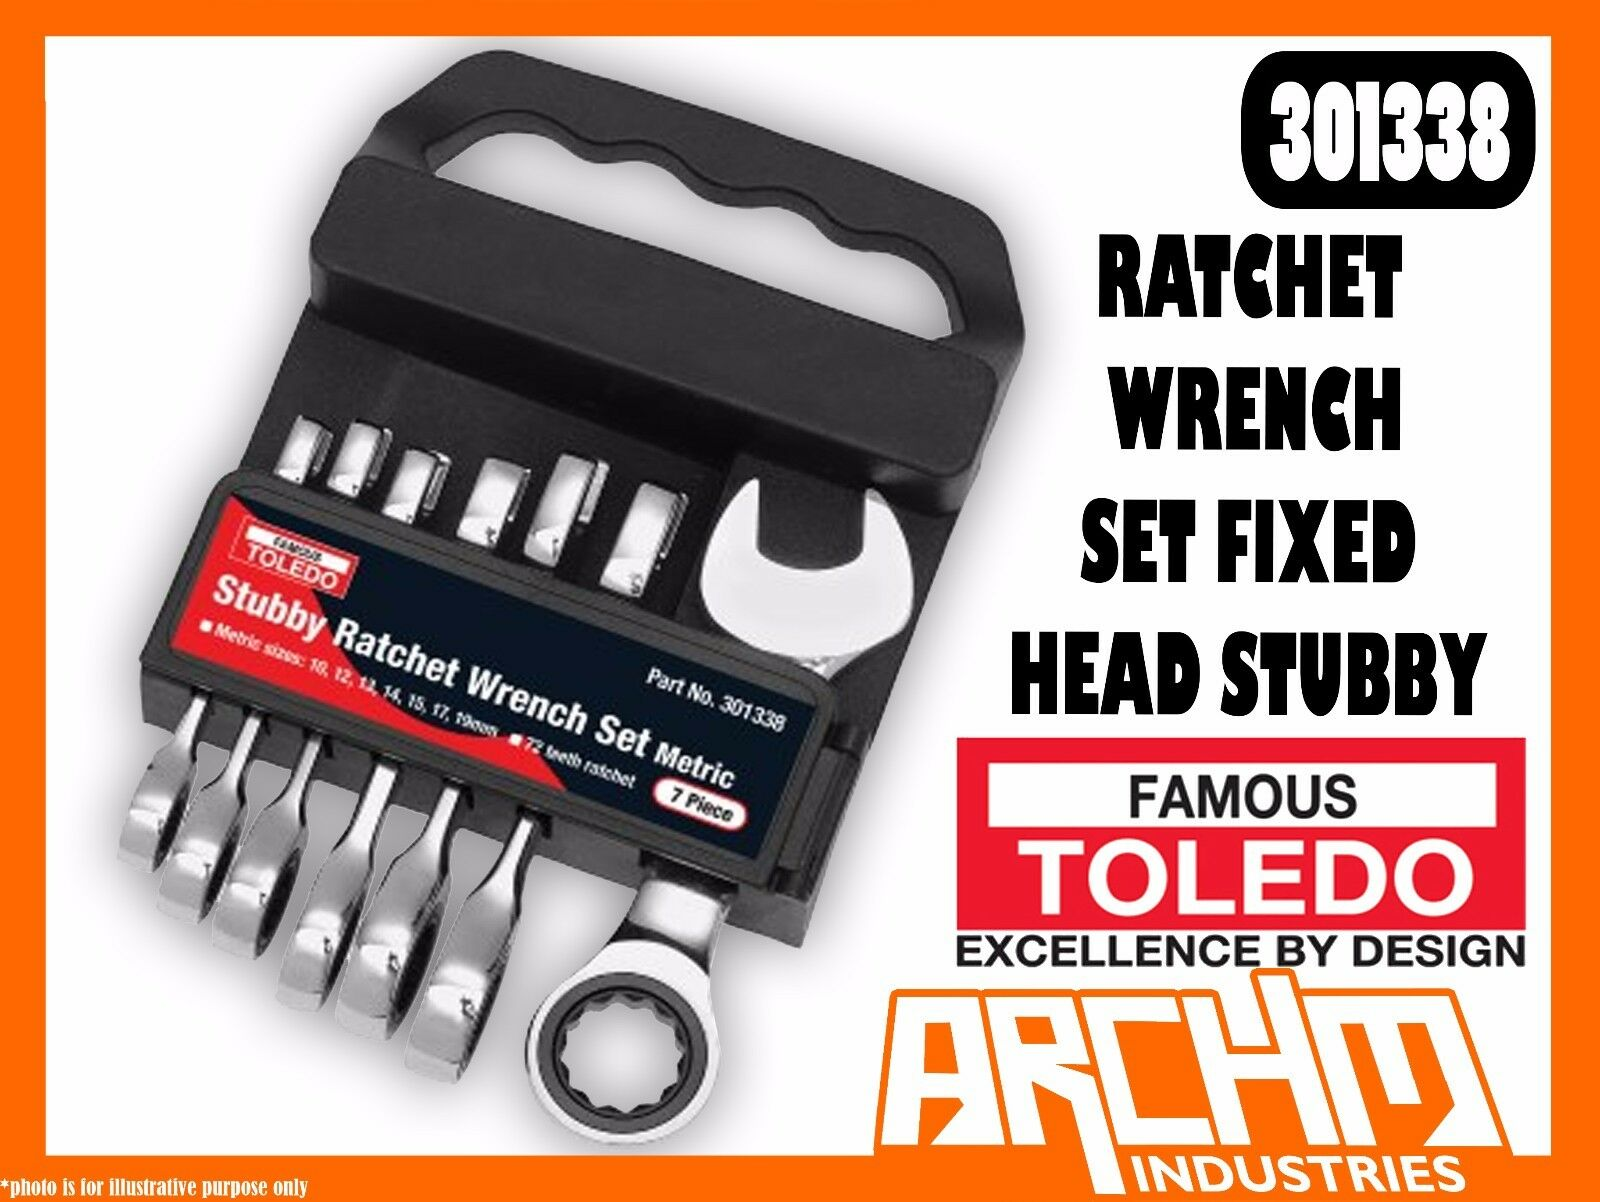 TOLEDO 301338  - RATCHET WRENCH SET FIXED HEAD STUBBY - METRIC 7 PC. (10-19MM)